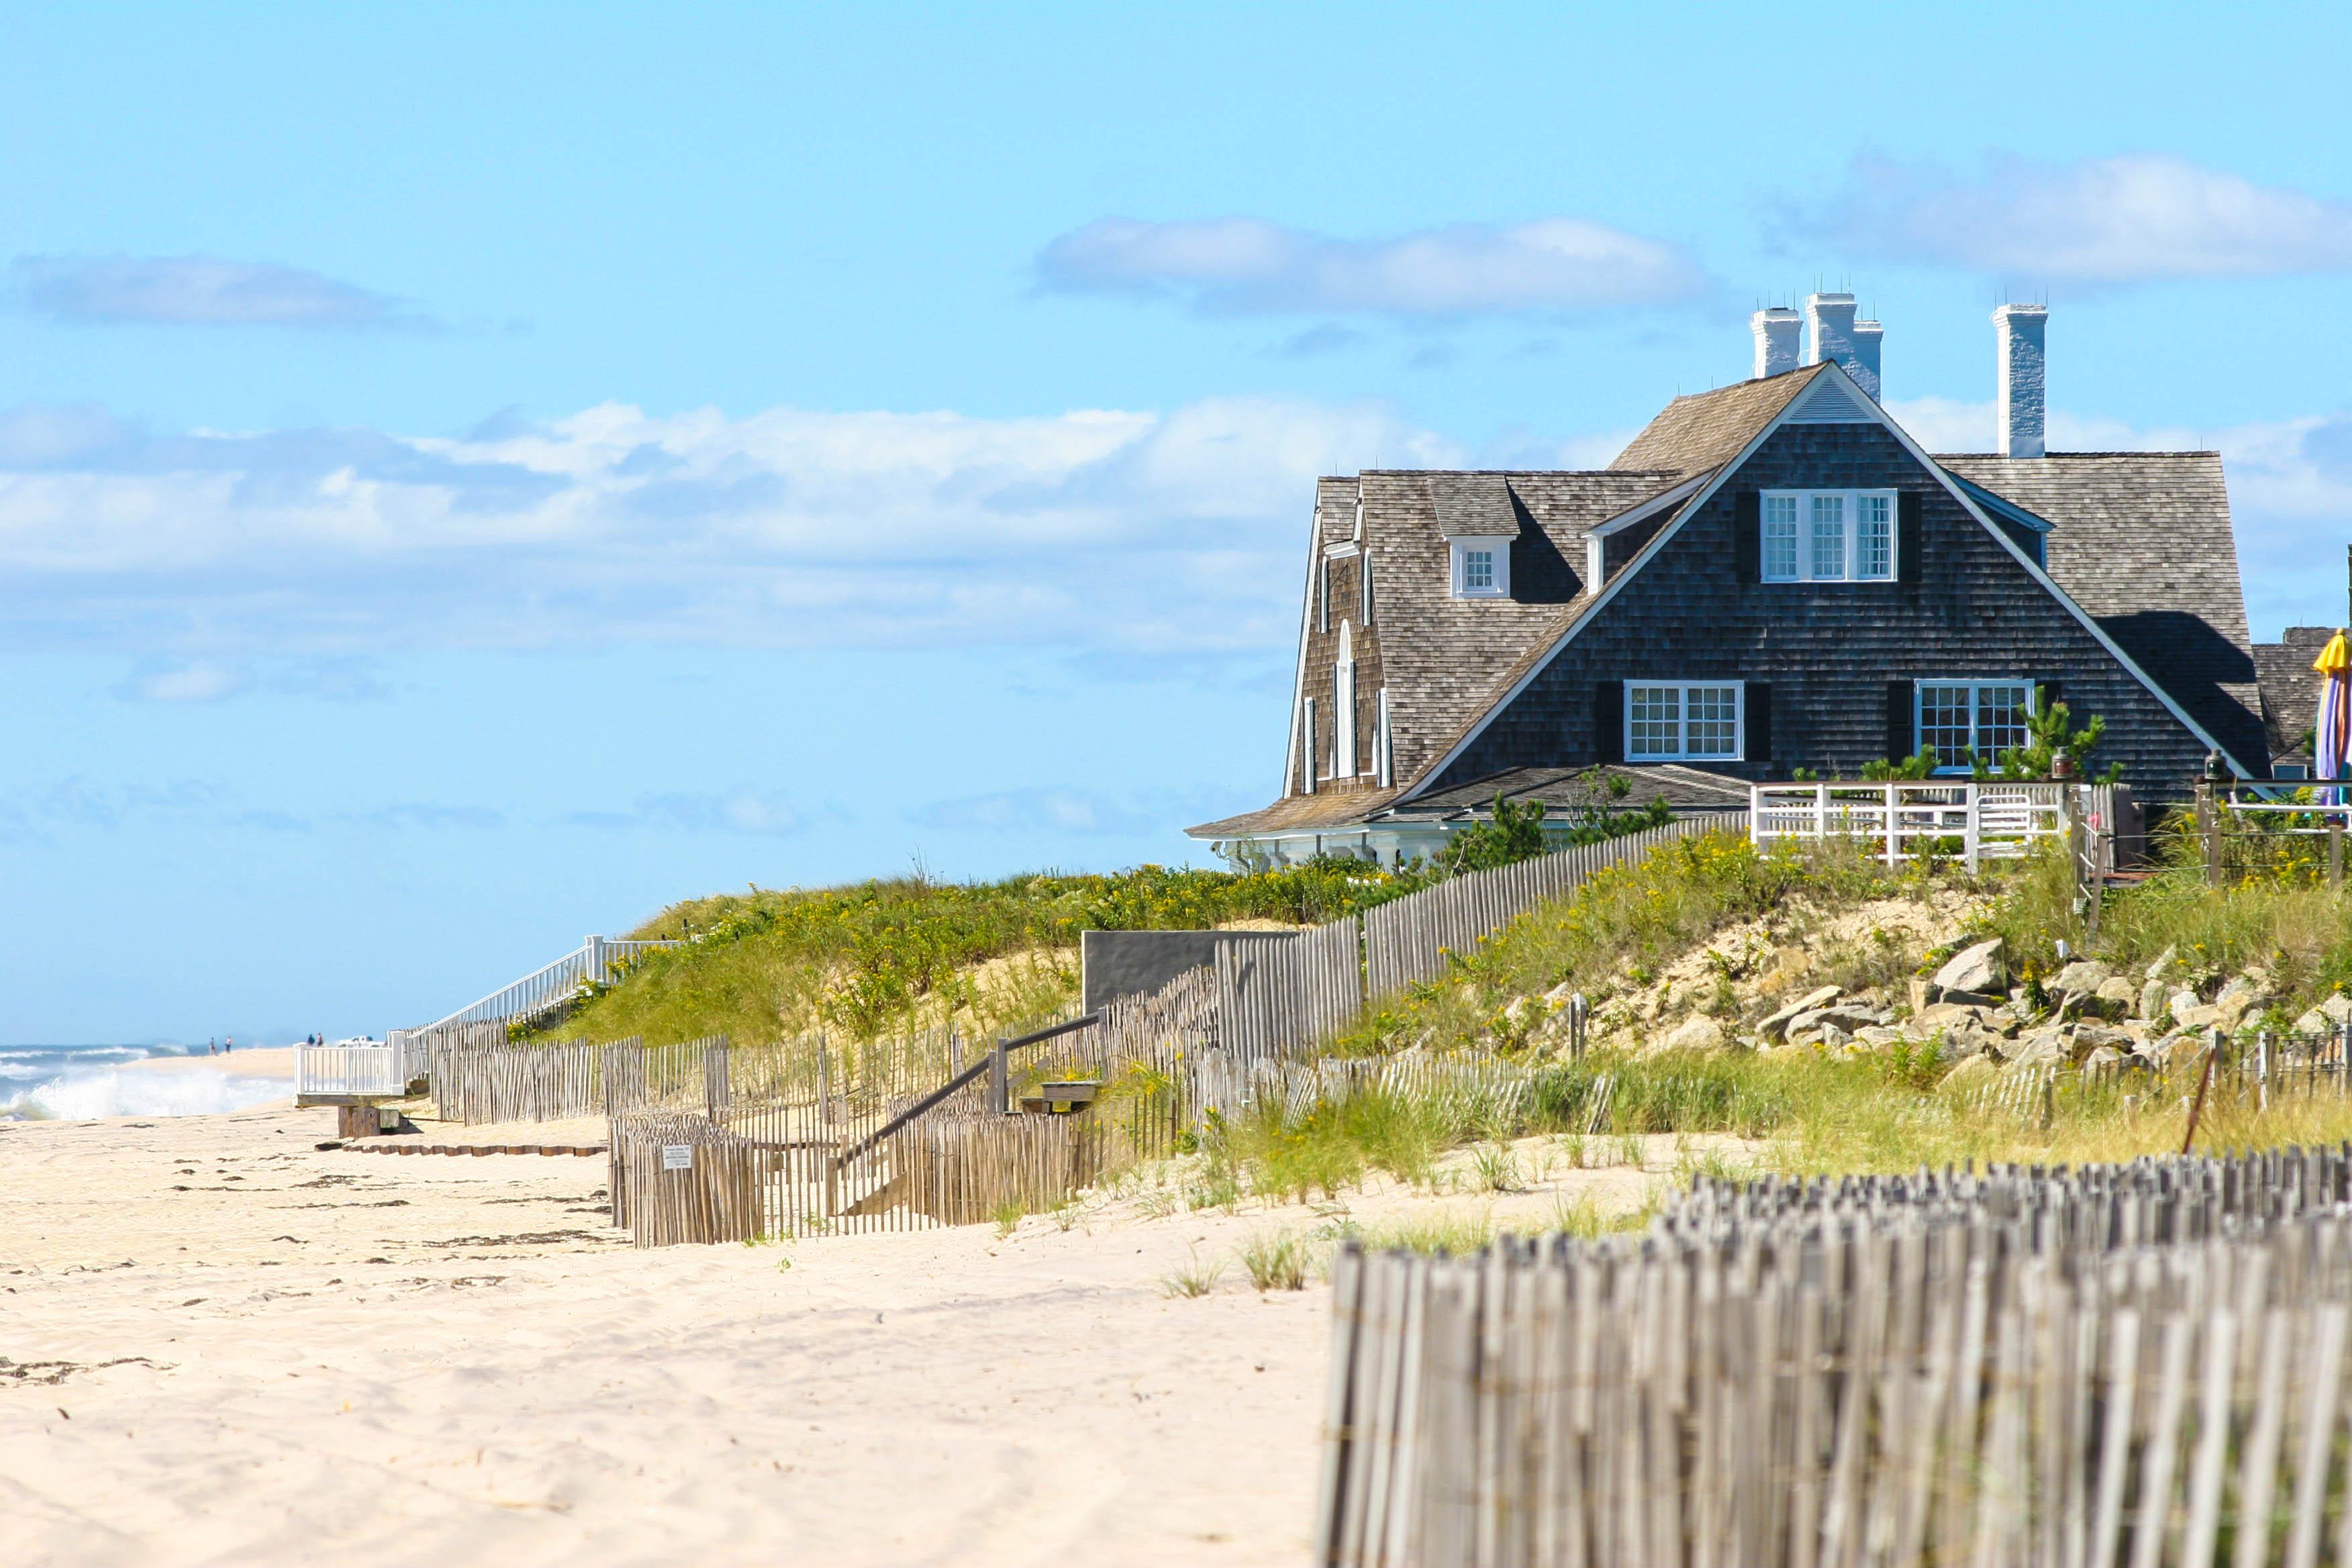 Entdeckt Die Hamptons Auf Long Island Urlaubsguru De